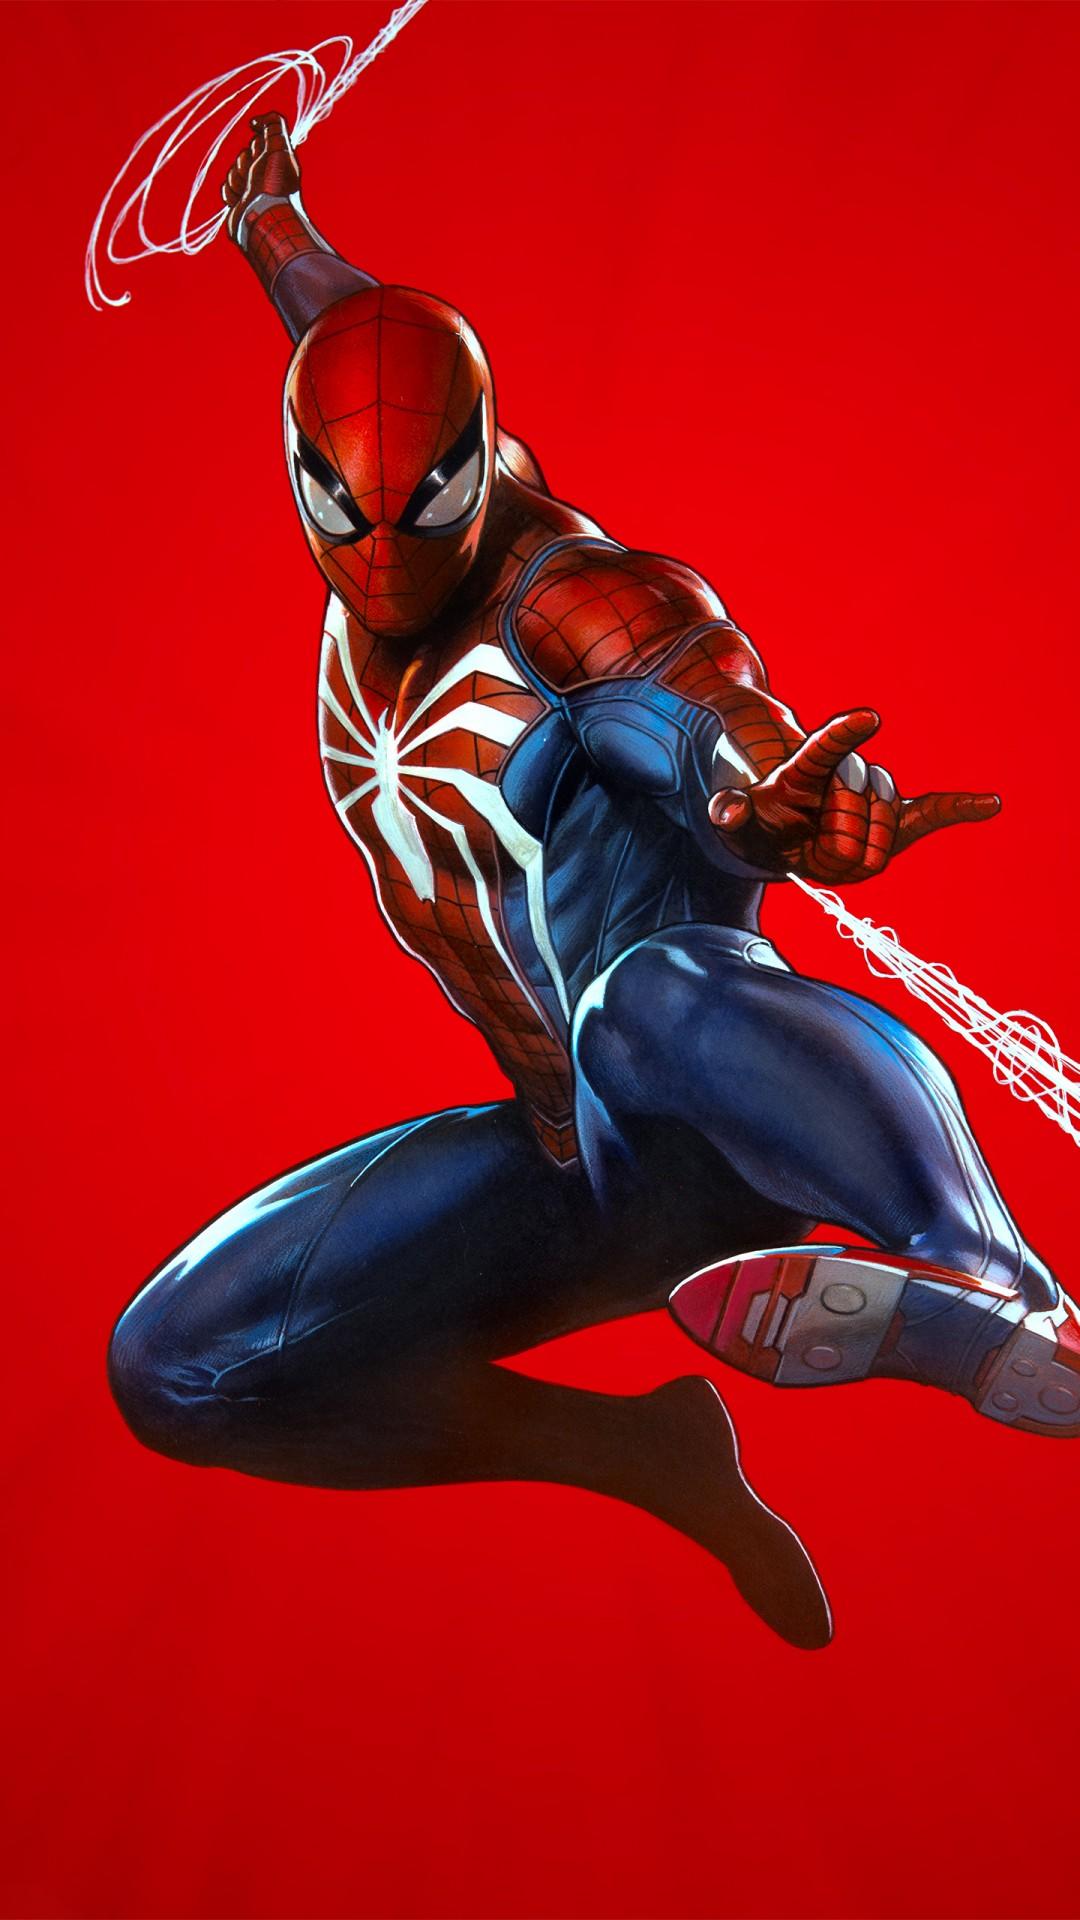 Spiderman Ps4 Wallpaper Hd Spider Man Ps4 Cover Art 4k 8k Wallpapers Hd Wallpapers